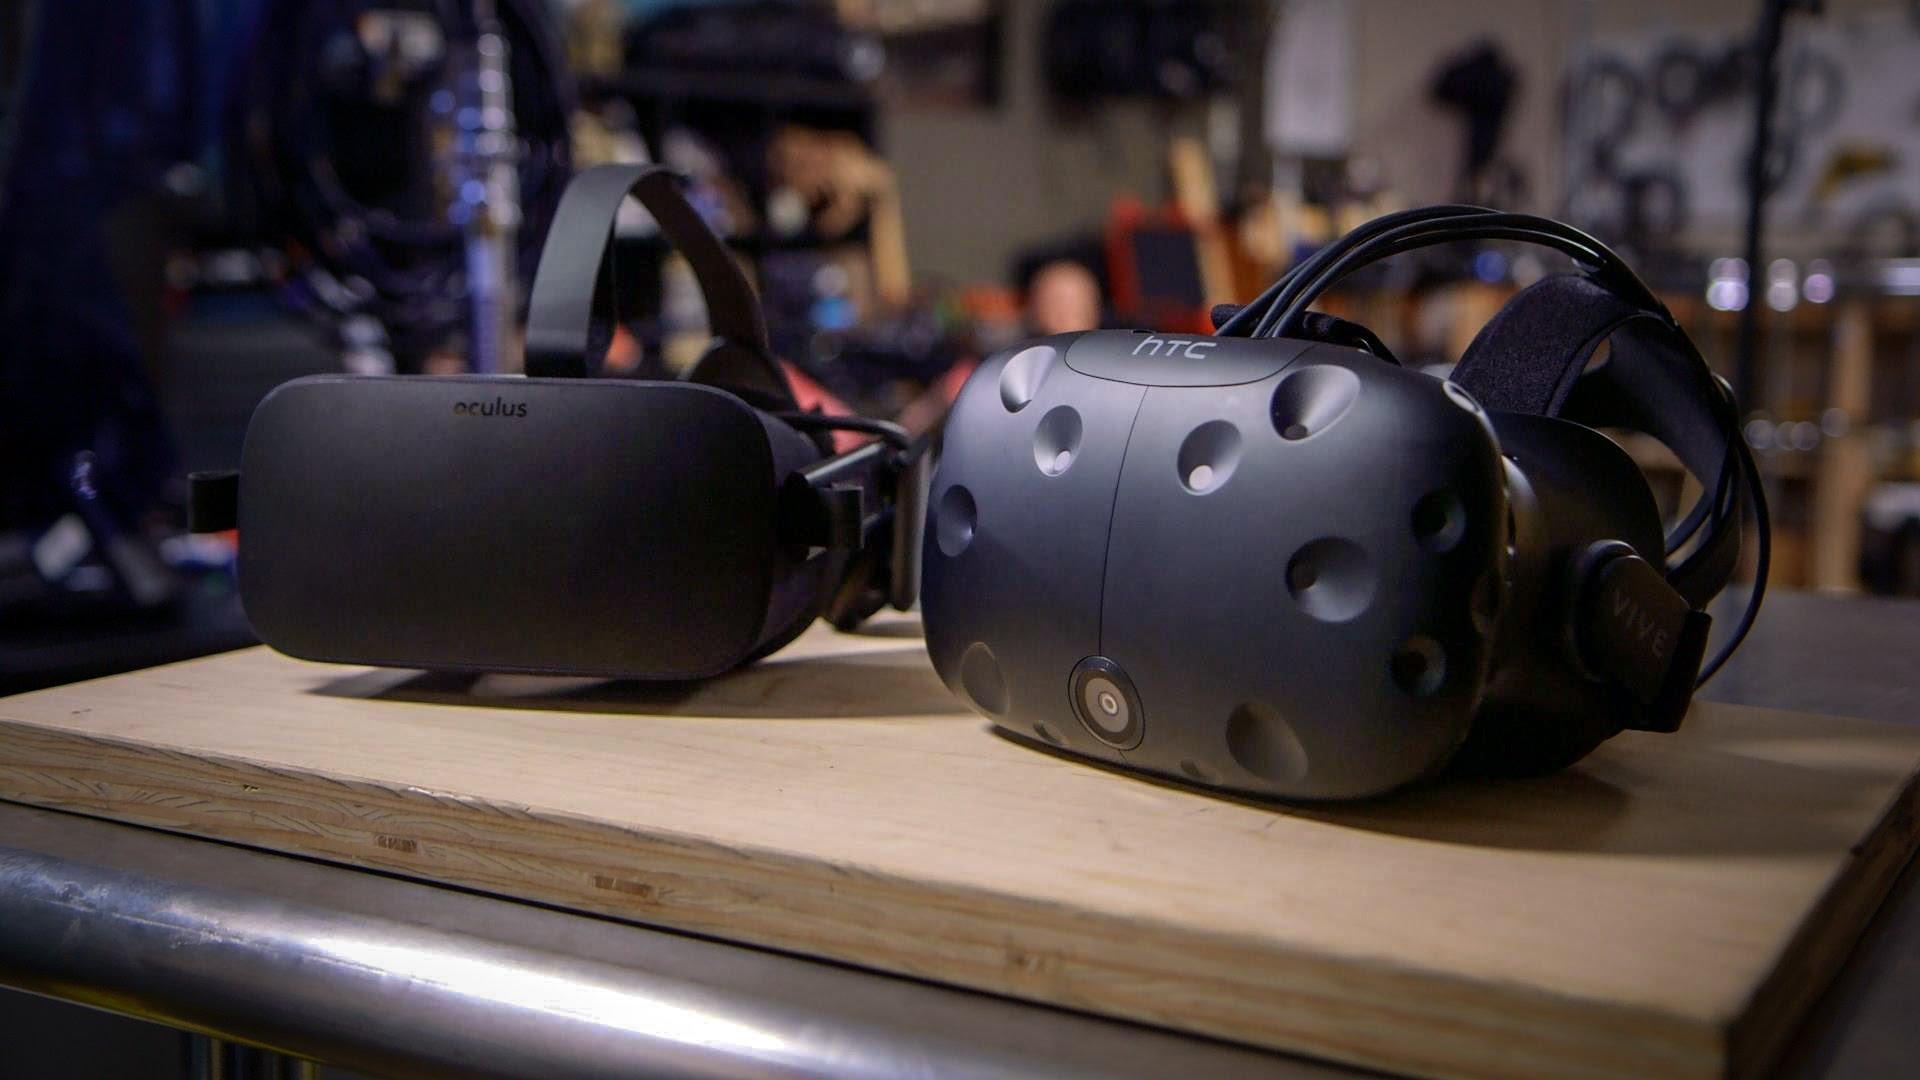 oculus-rift-vs-htc-vive